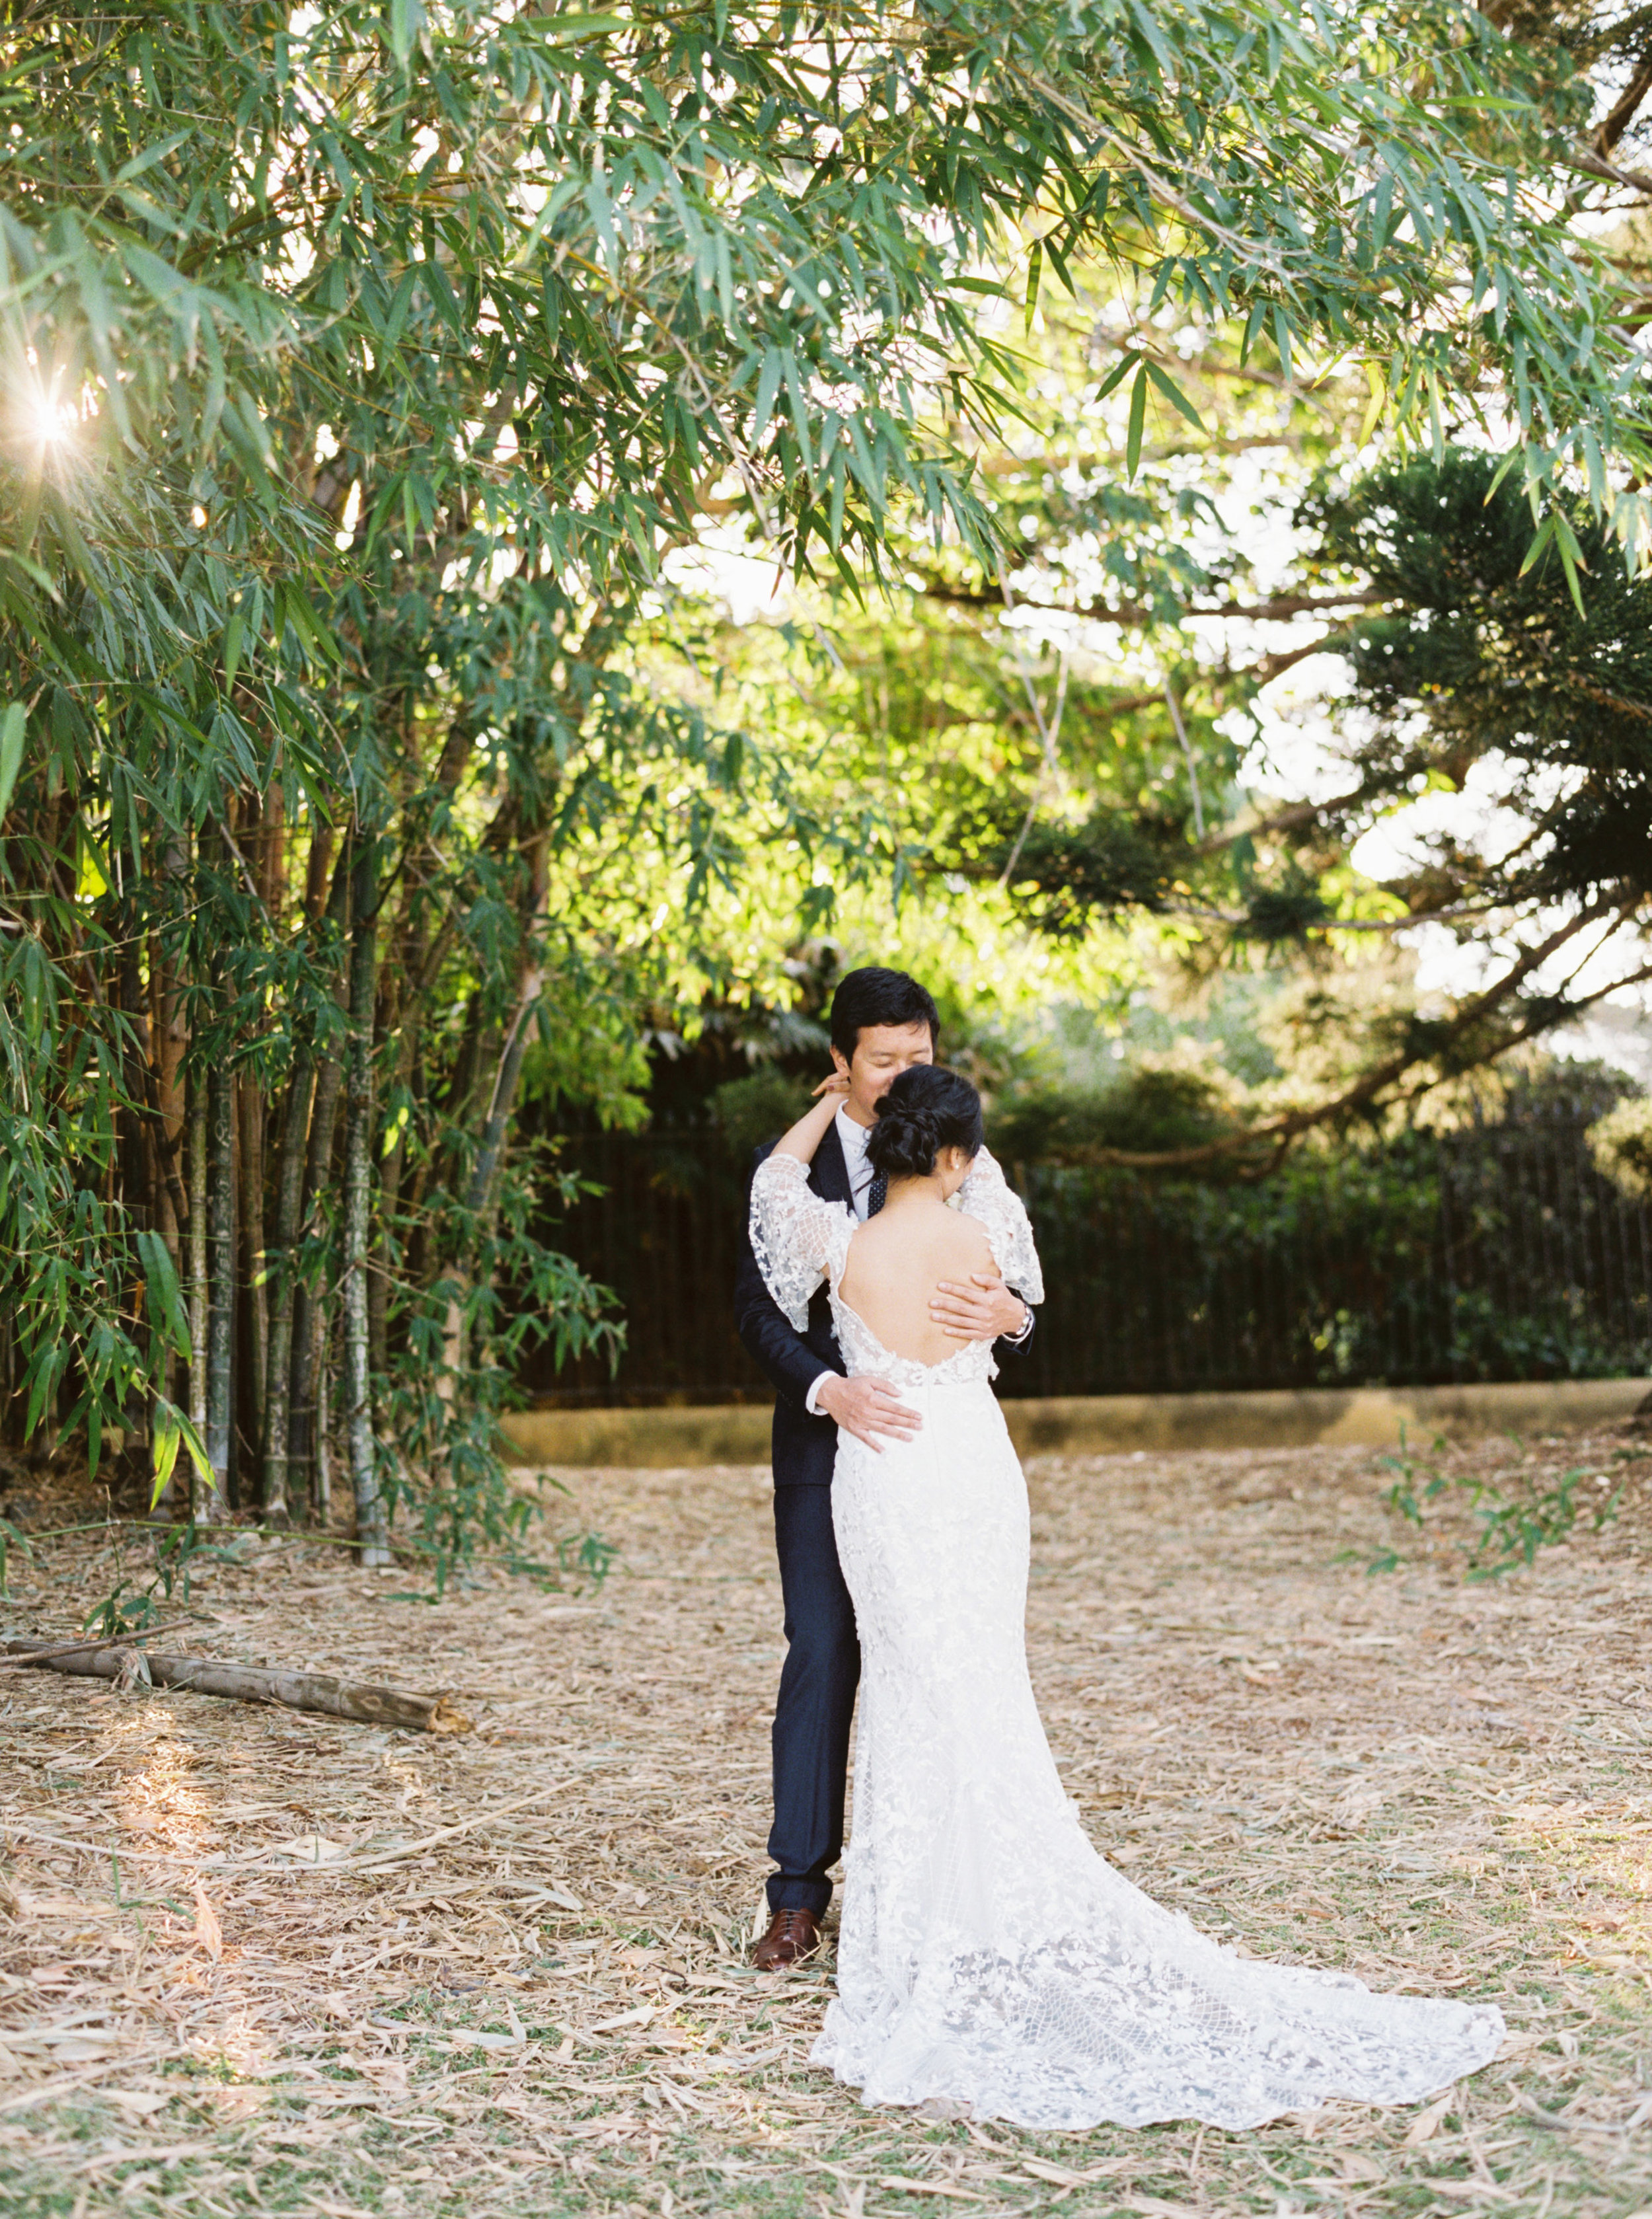 00032- Fine Art Film Australia Destination Sydney Wedding Photographer Sheri McMahon.jpg